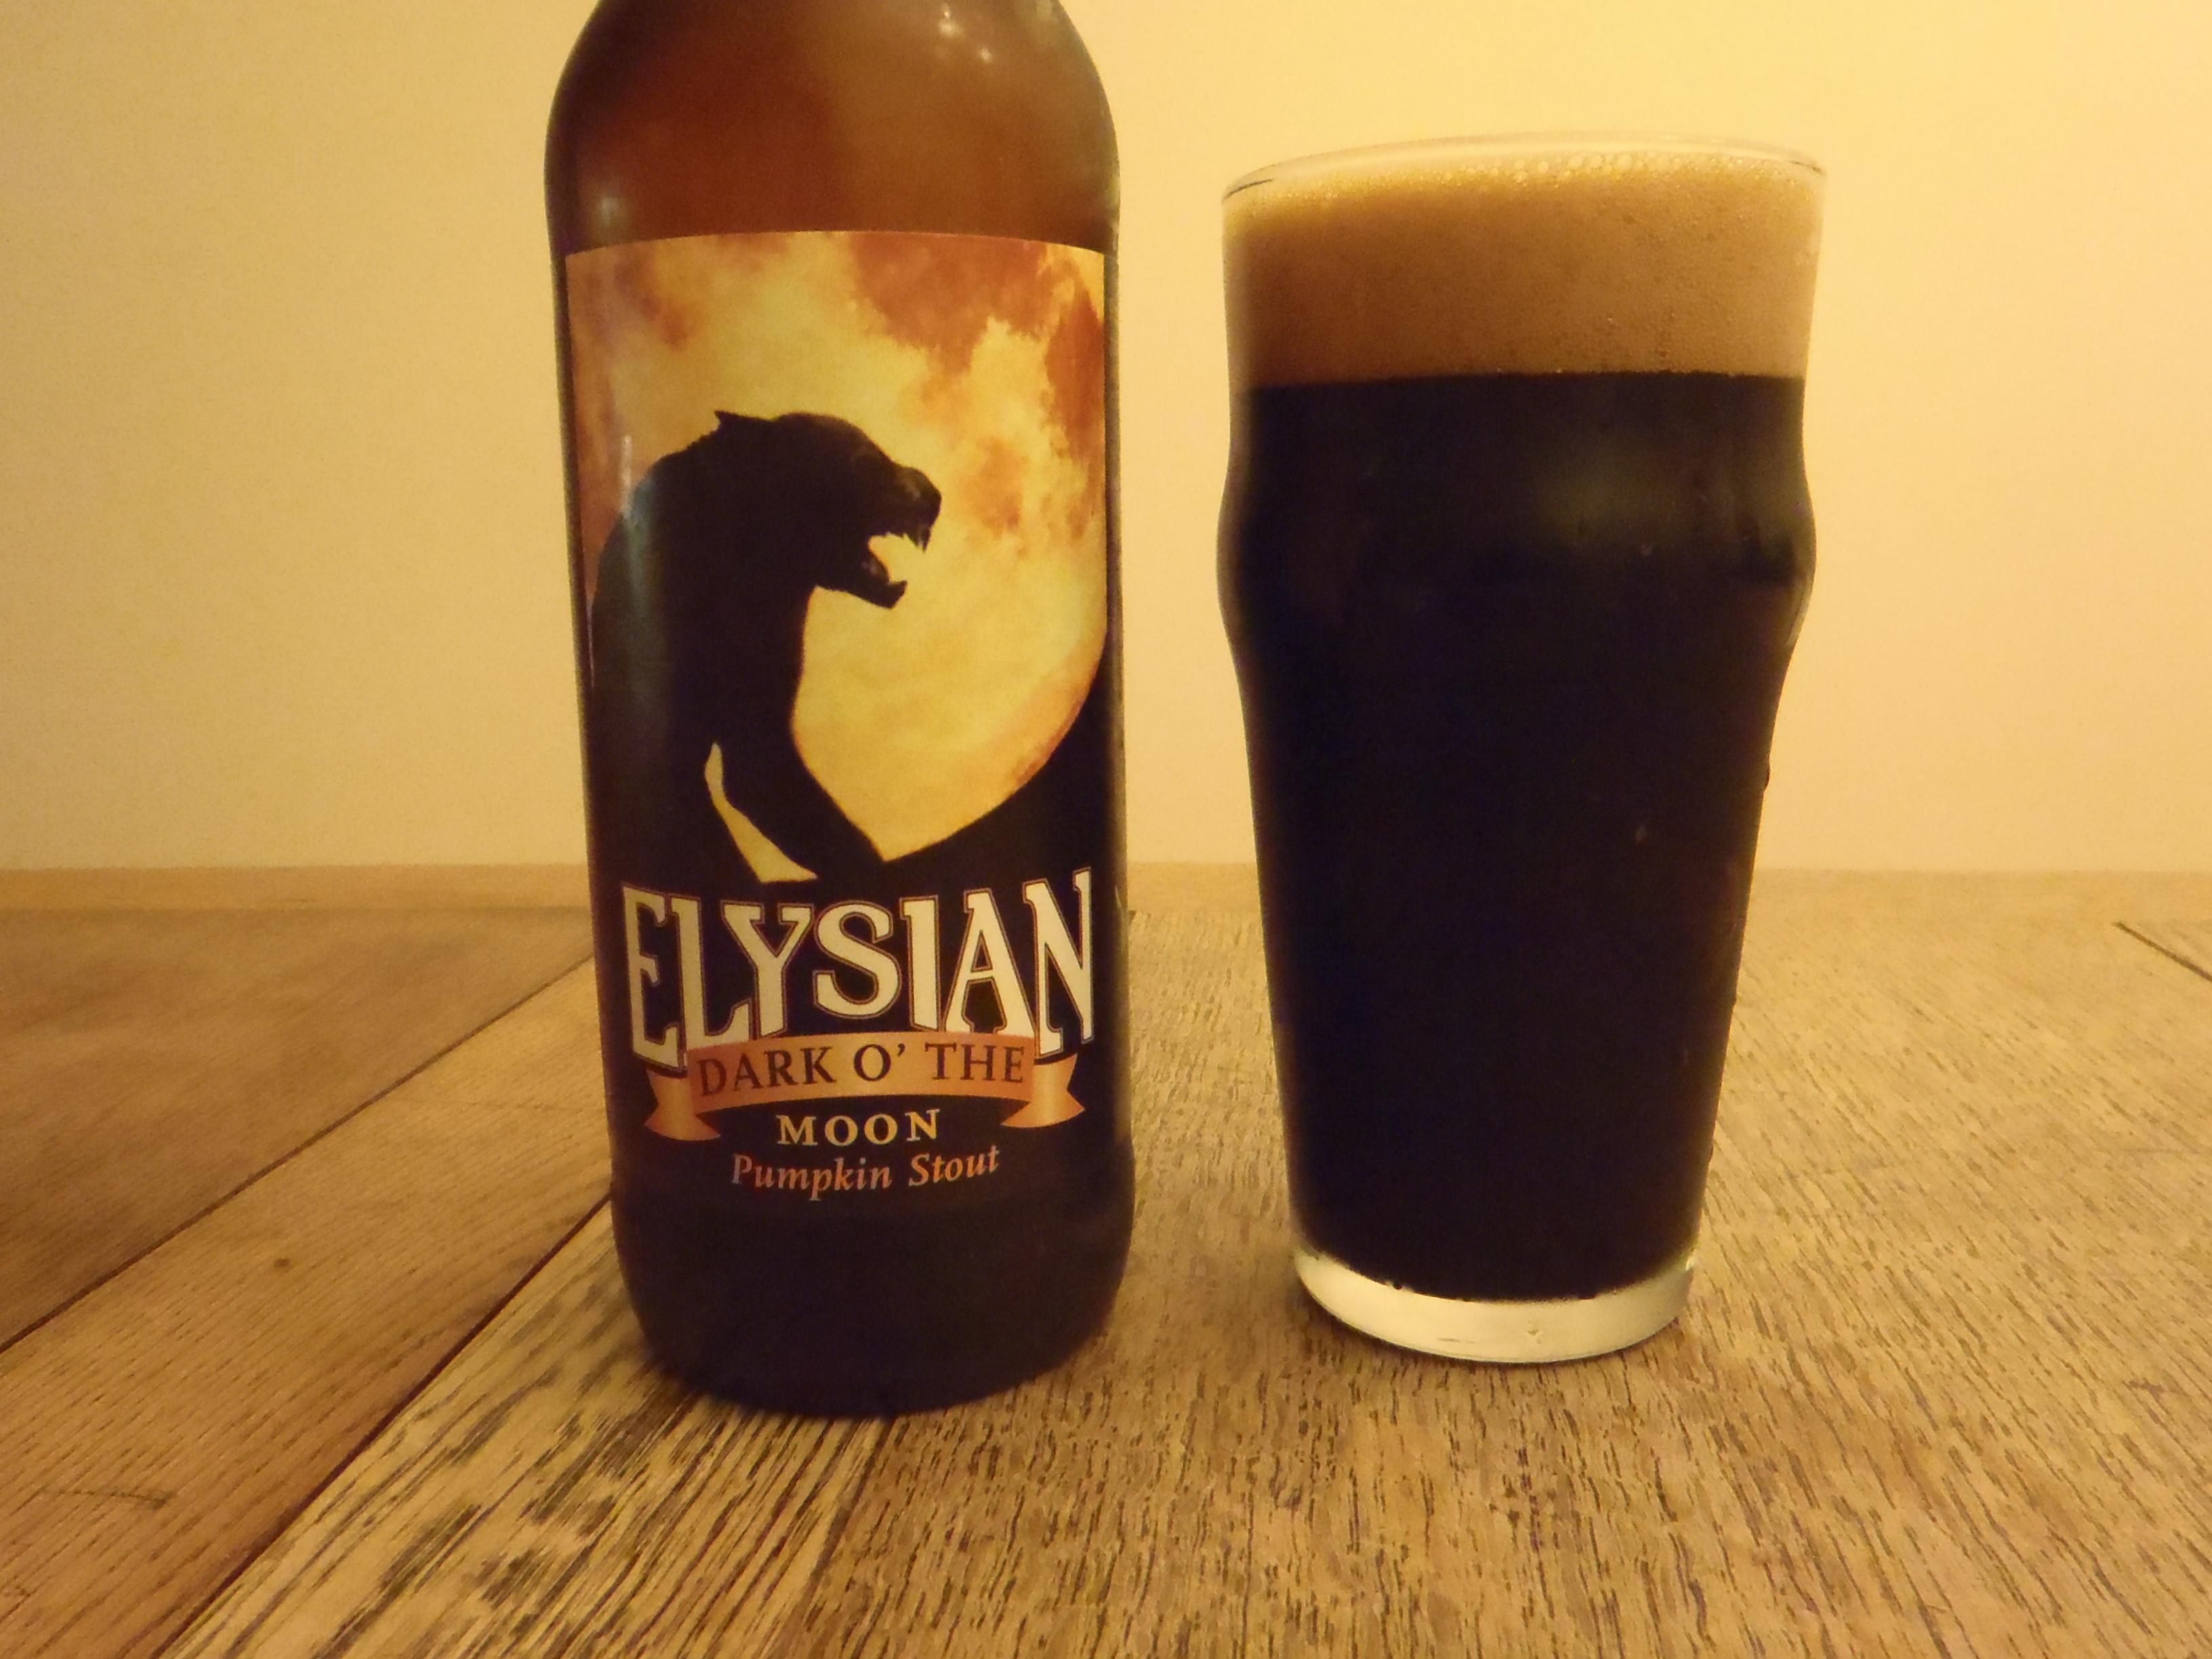 Elysian Dark o' the Moon Pumpkin Stout